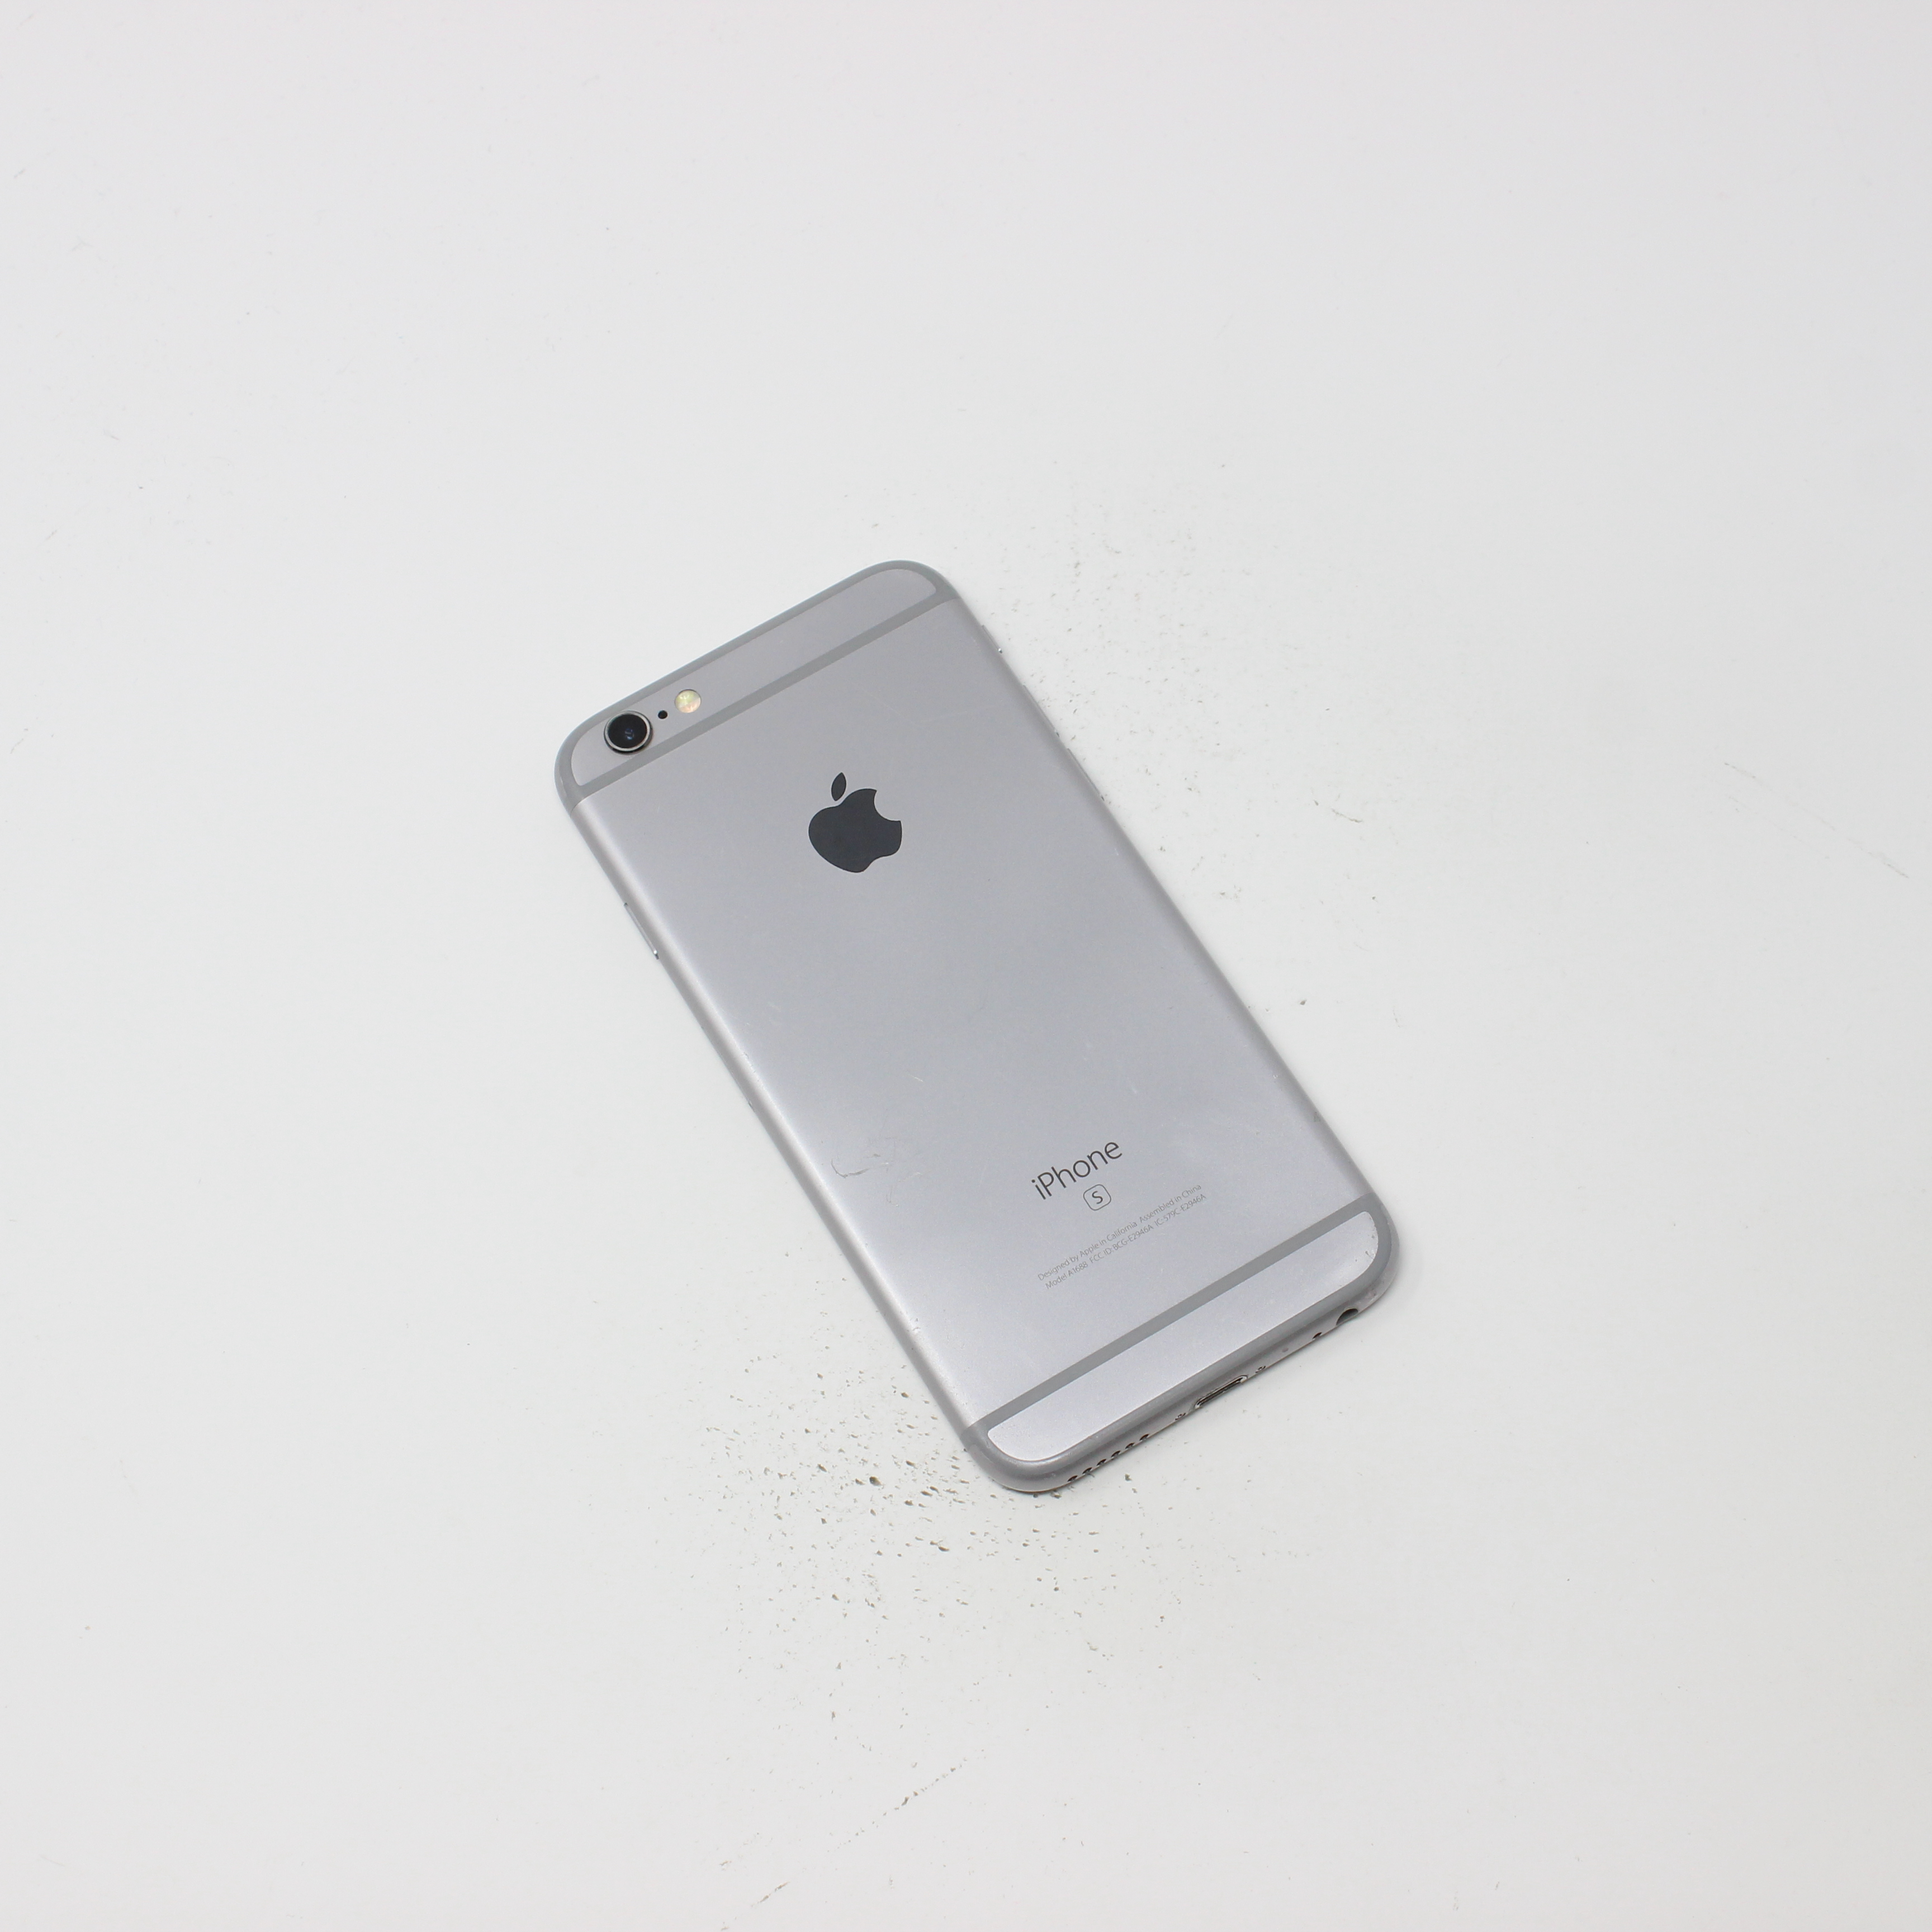 iPhone 6S 16GB Space Gray - Verizon photo 3   UpTradeit.com